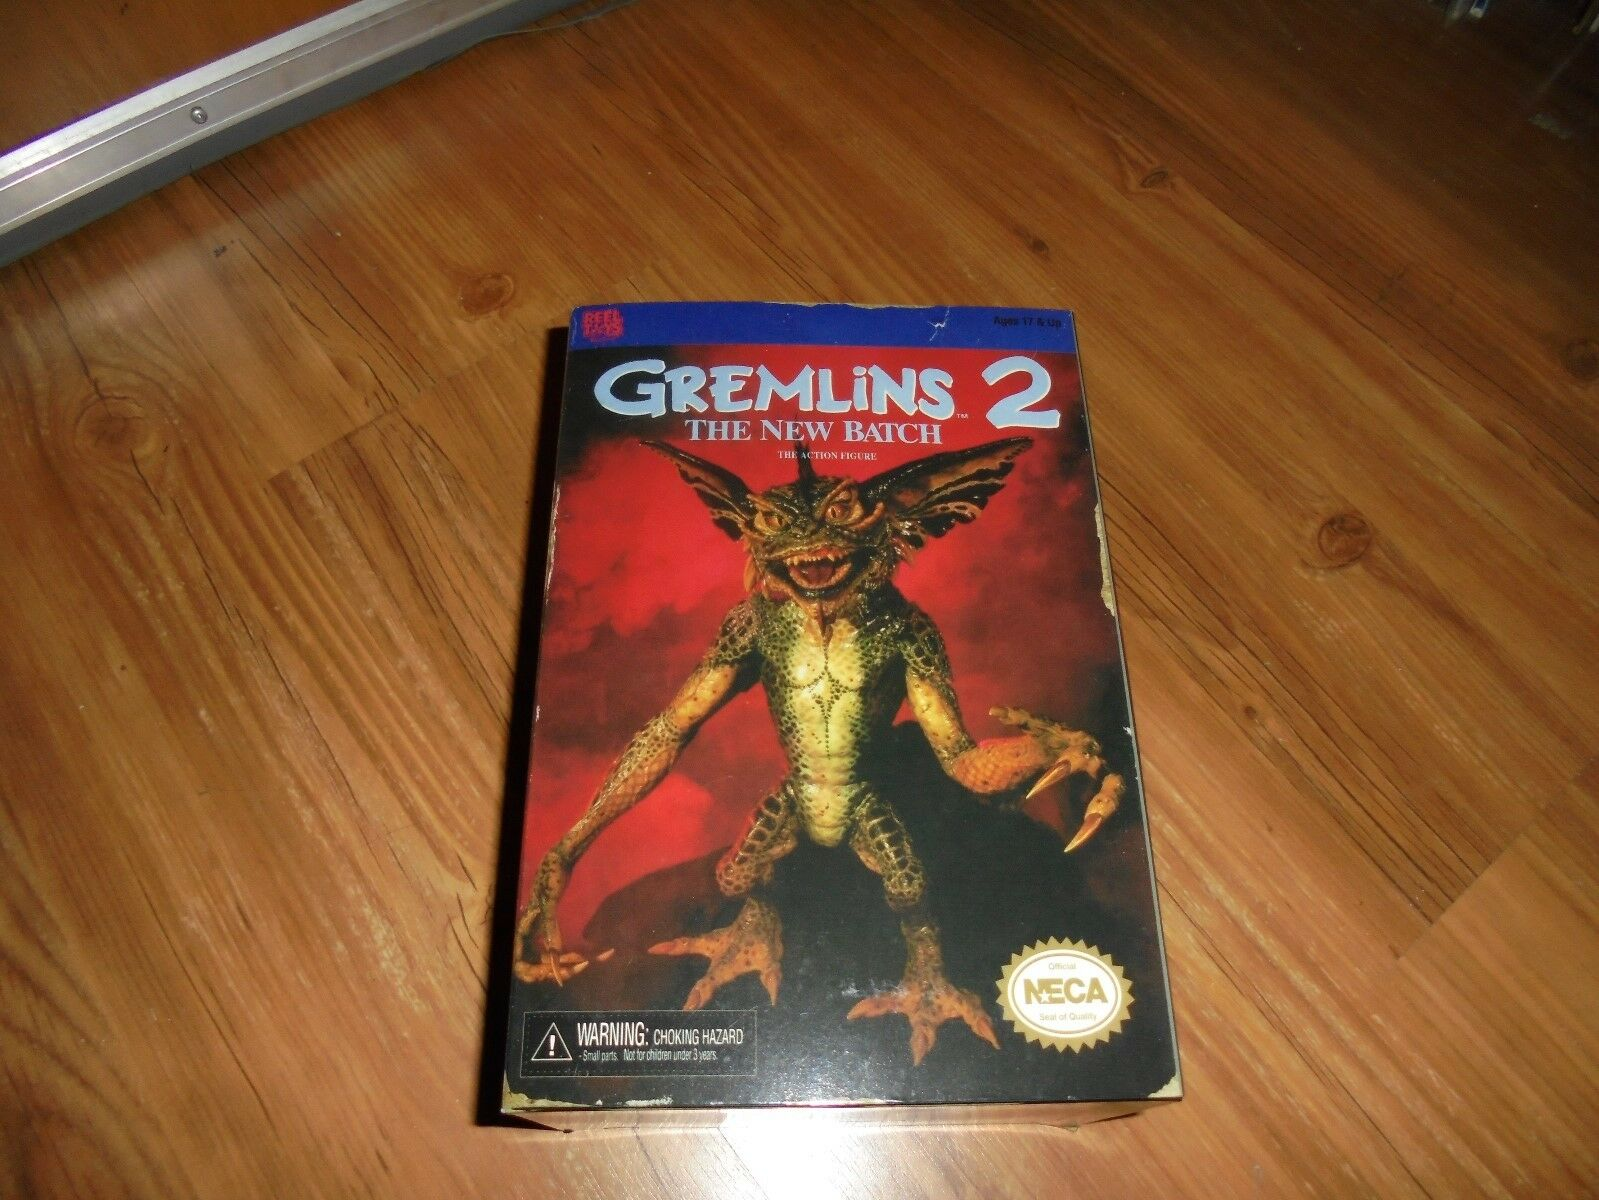 Gremlins 2 The New batch game game game  GIZMO  Action Figure NECA 2015 da2034